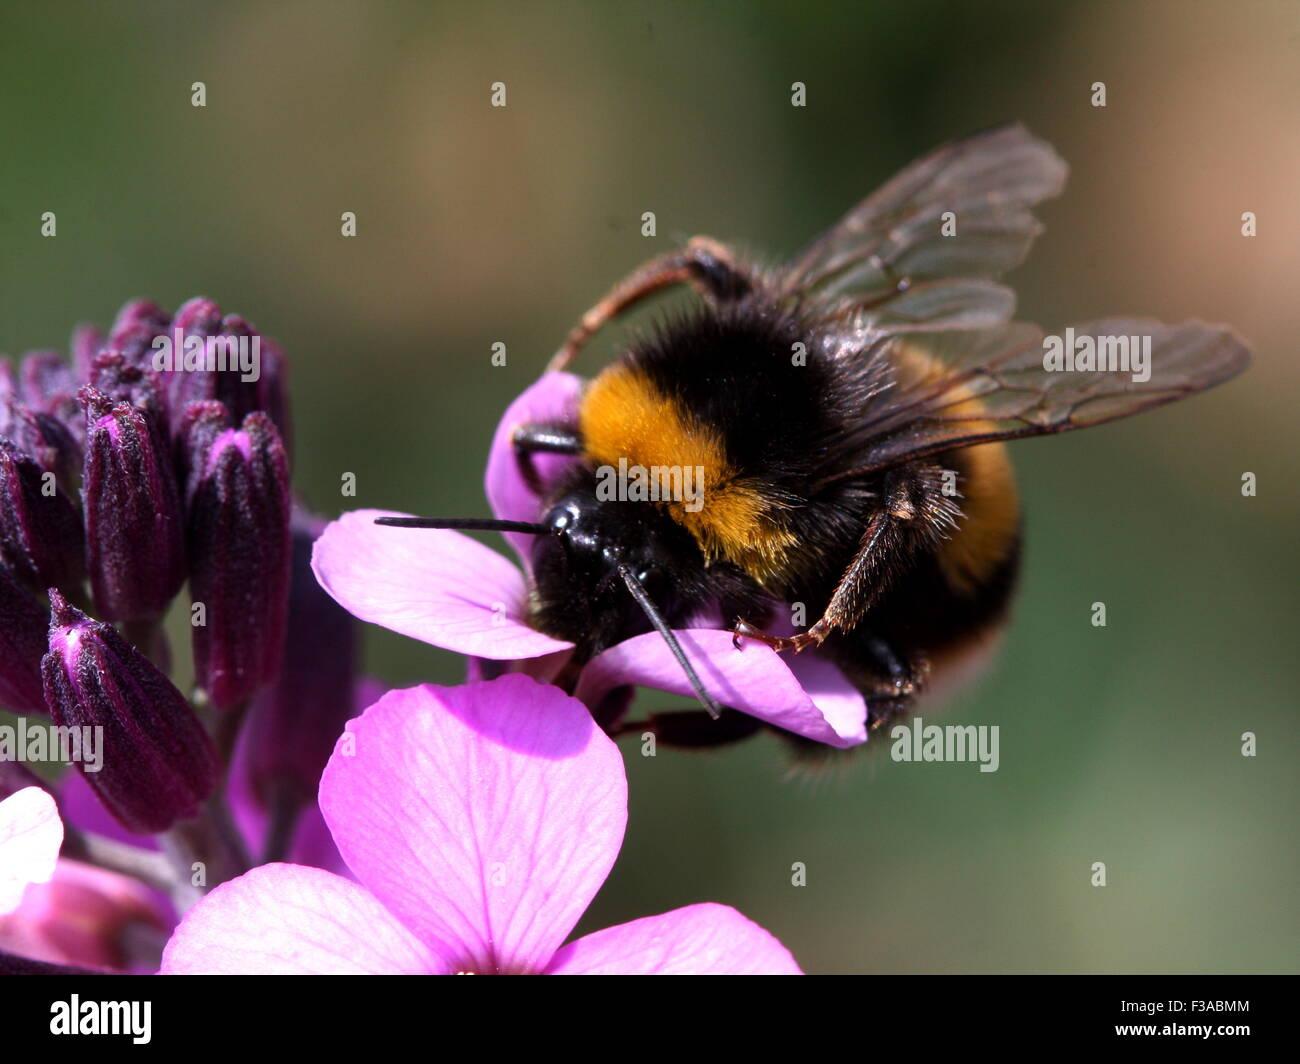 Hummel auf Blume Stockbild